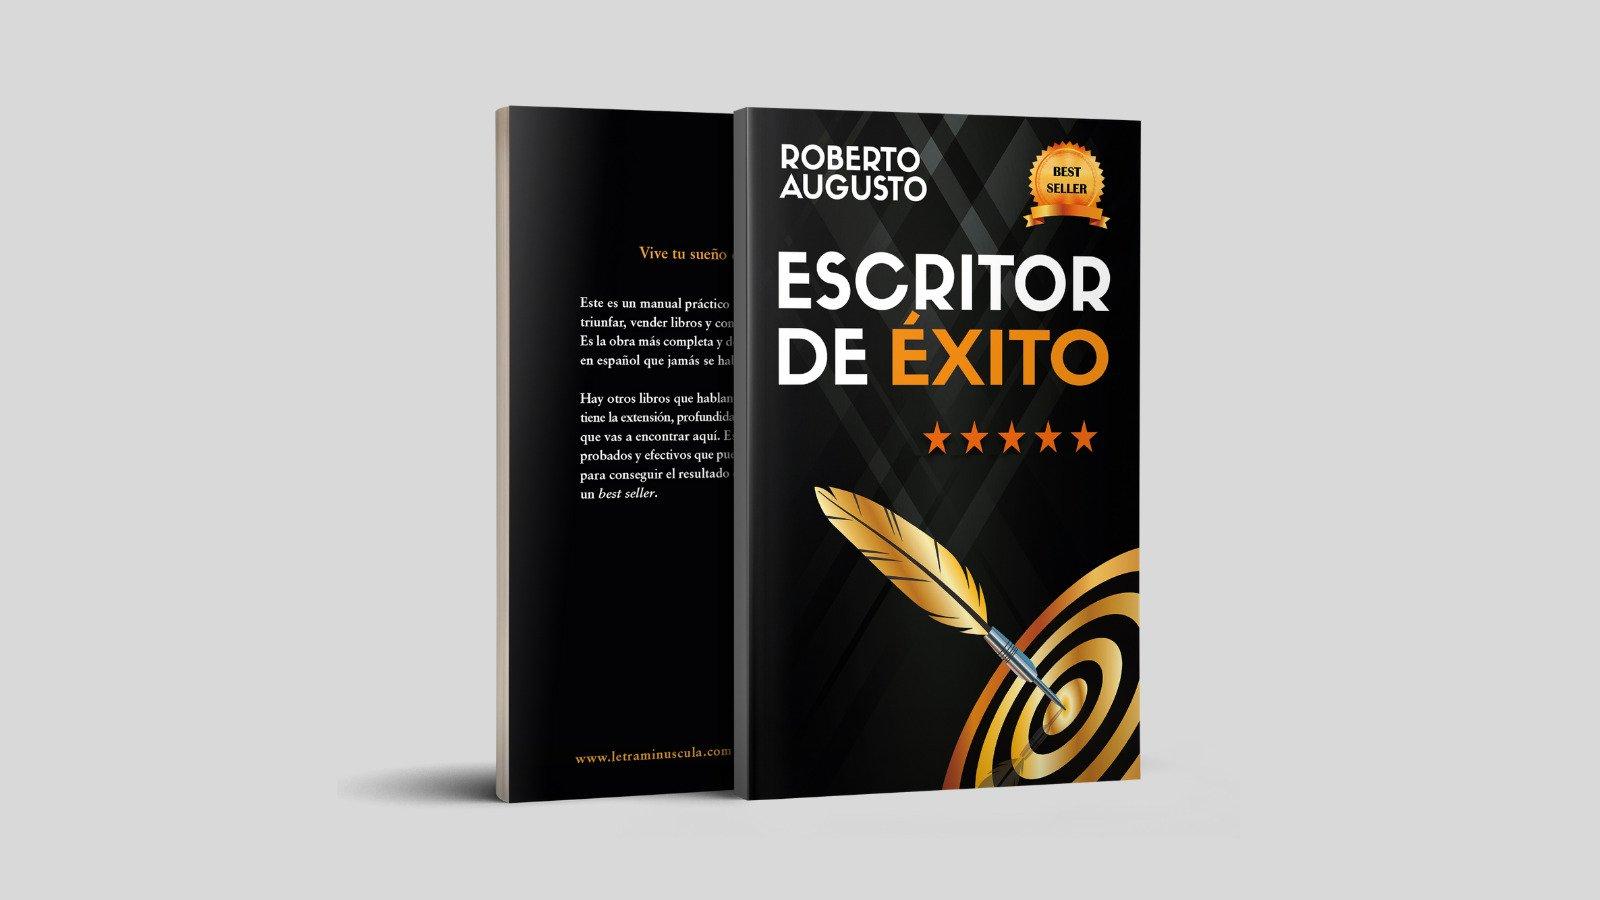 Escritor de éxito de Roberto Augusto